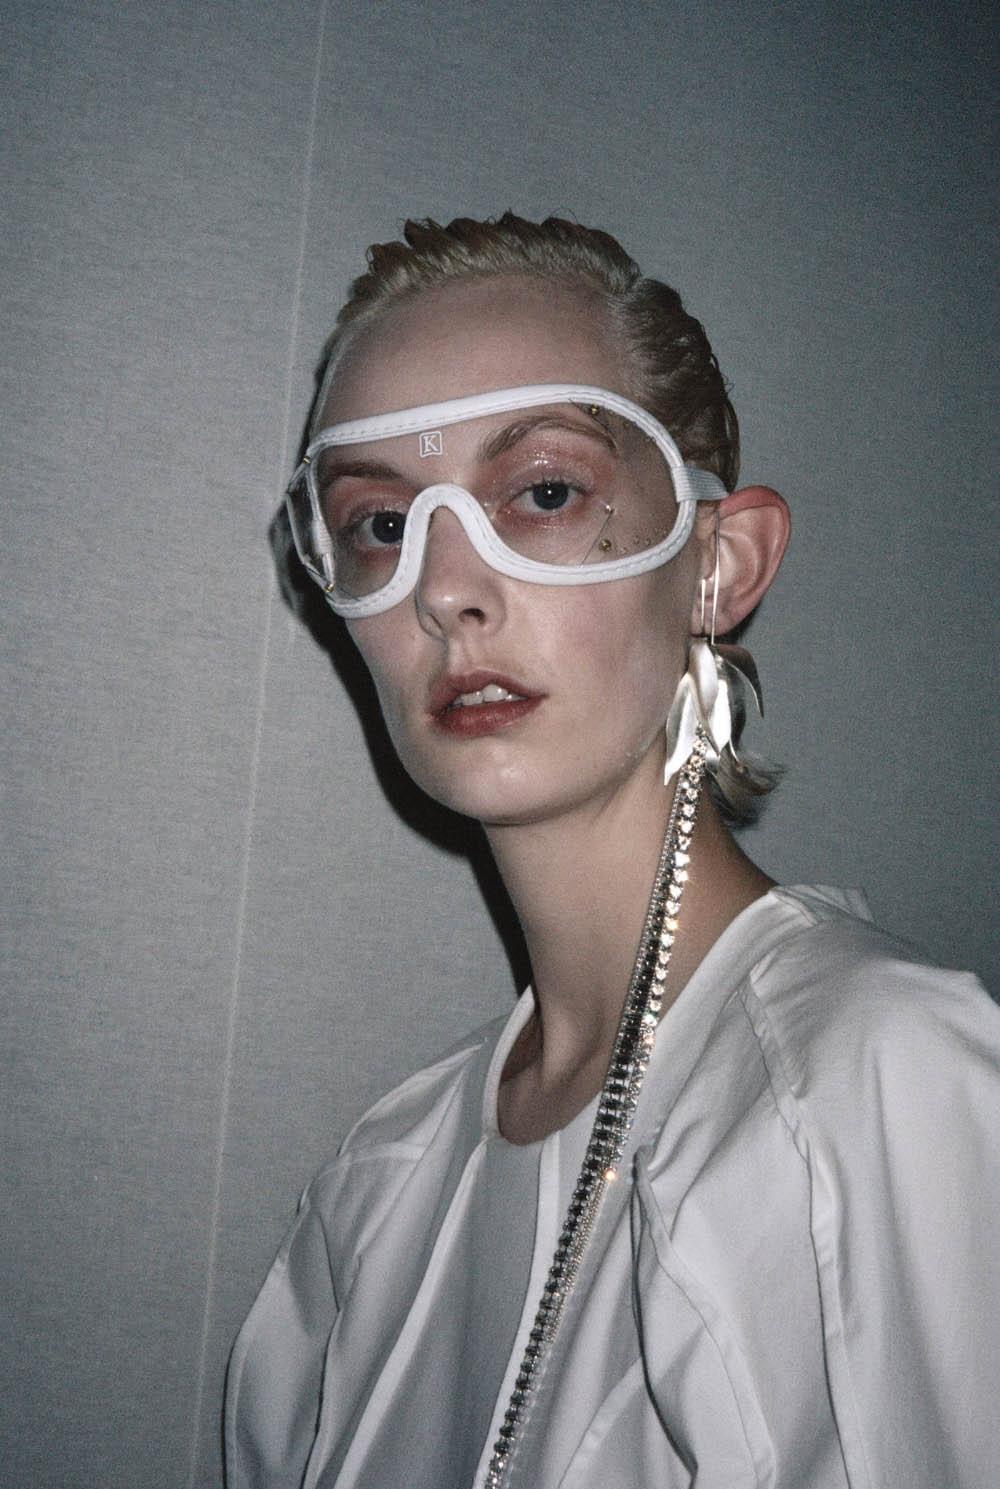 Ann-Sofie-Madsen-SS18-06.jpg